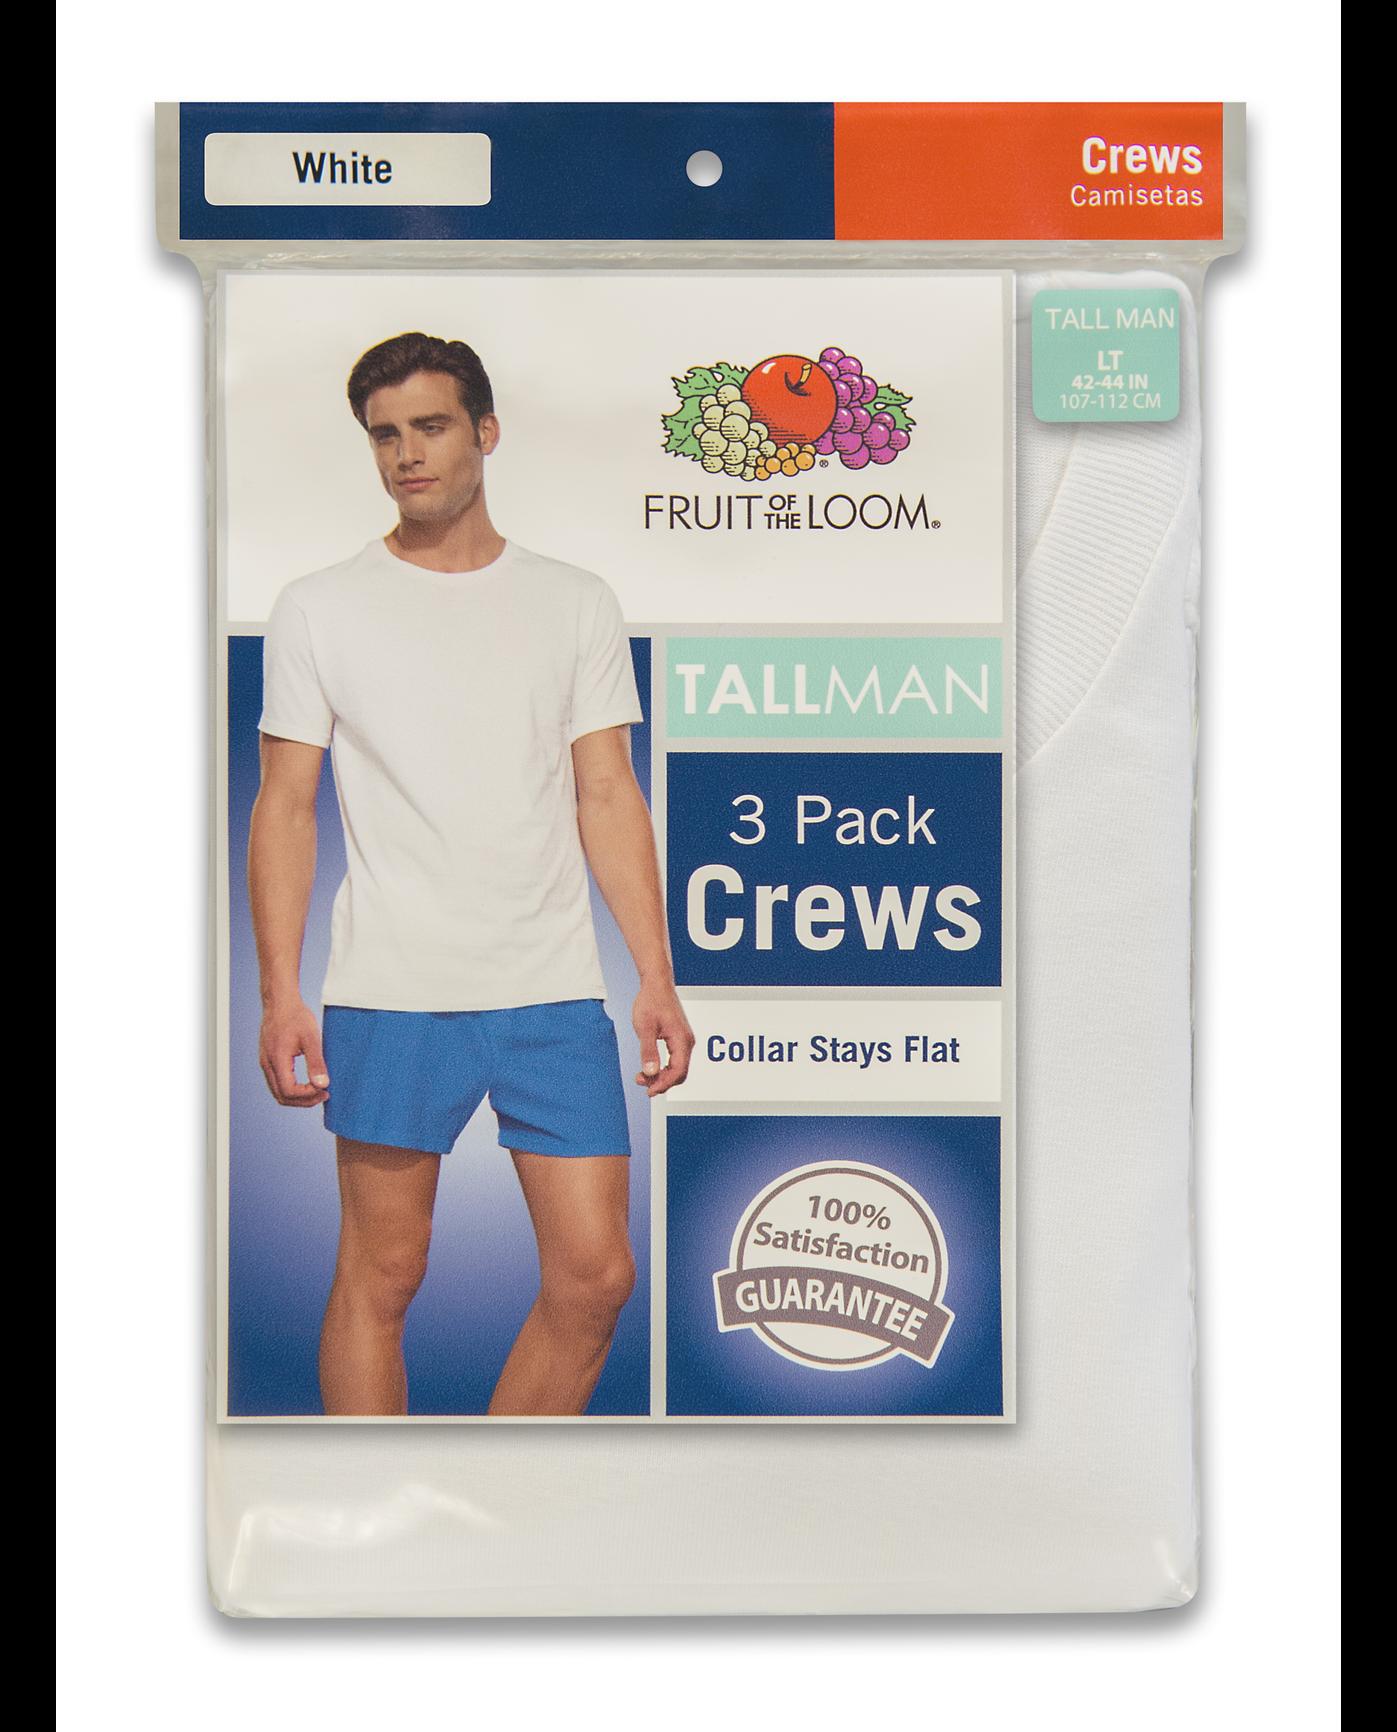 2a607c9eb02 Men s 3 Pack Tall Man White Crew T-Shirt - Fruit US